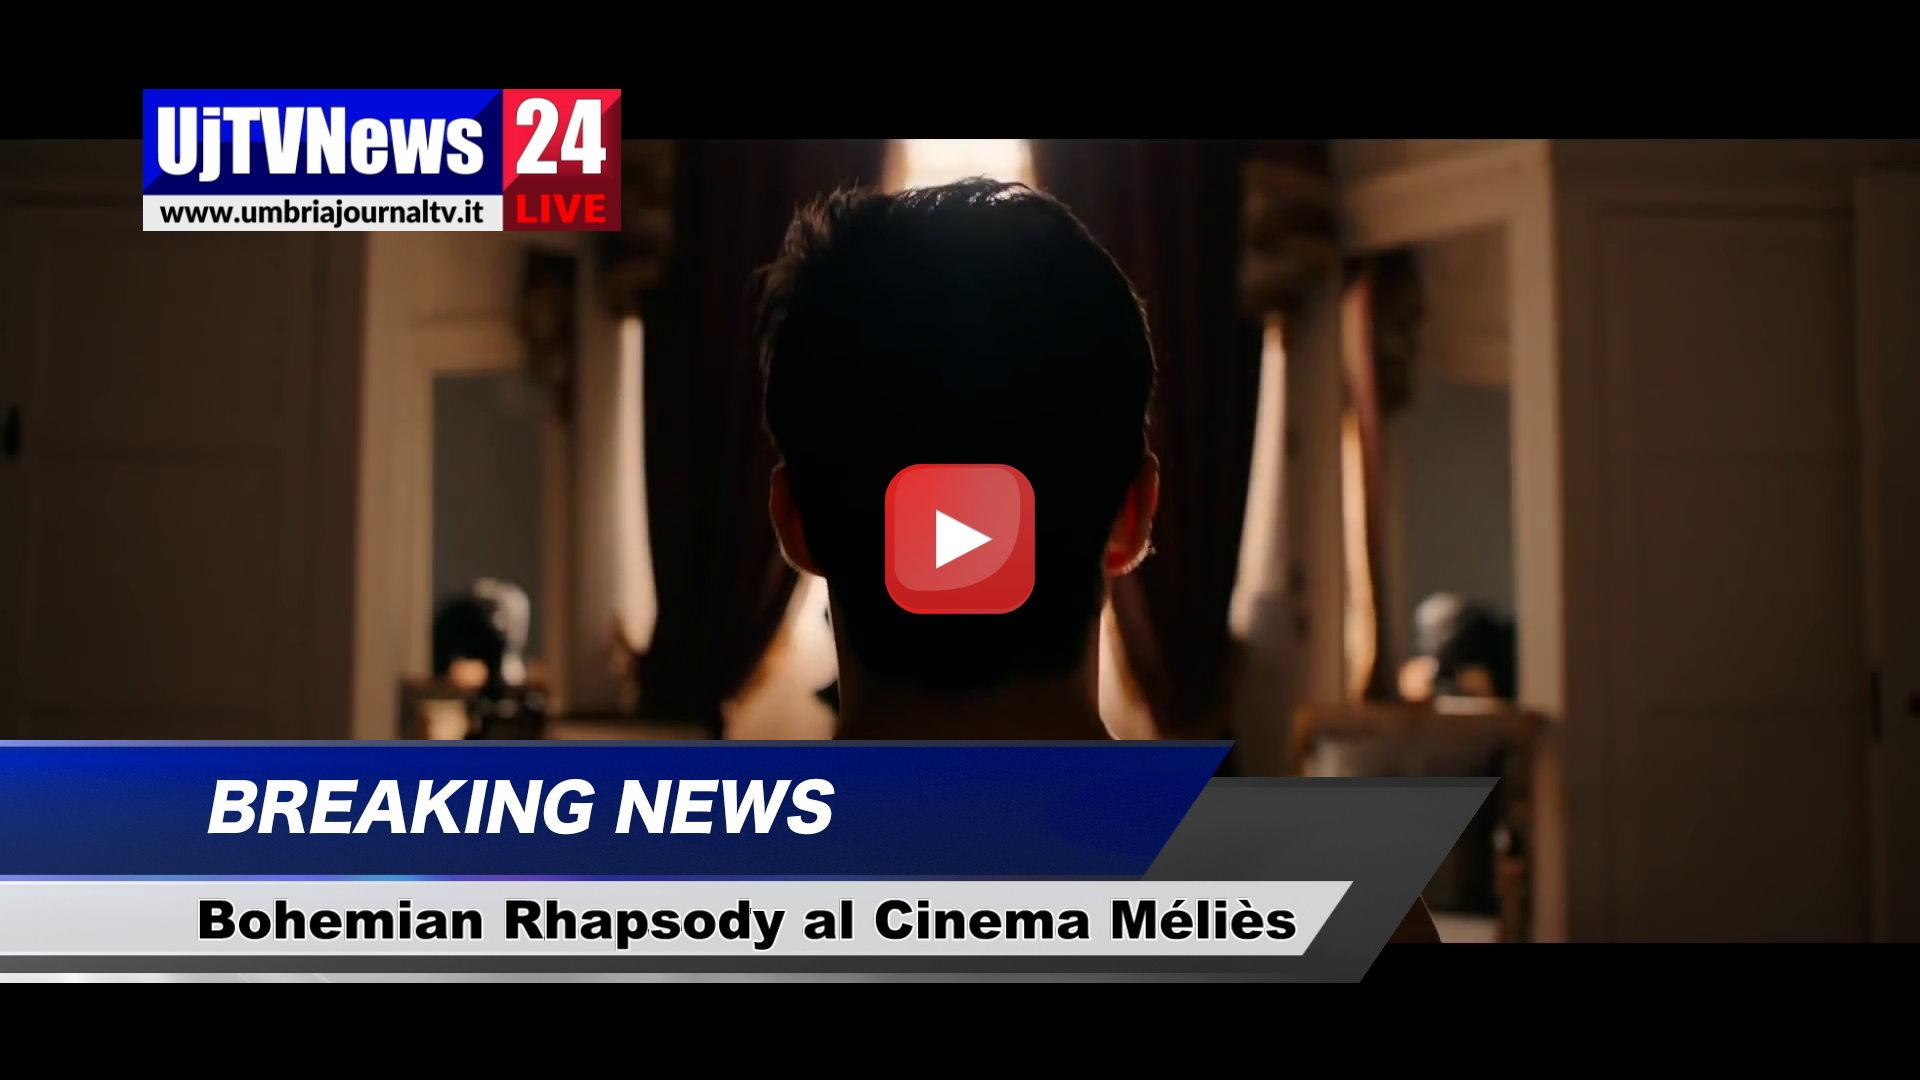 Bohemian Rhapsody, fino al 21 gennaio al Cinema Méliès